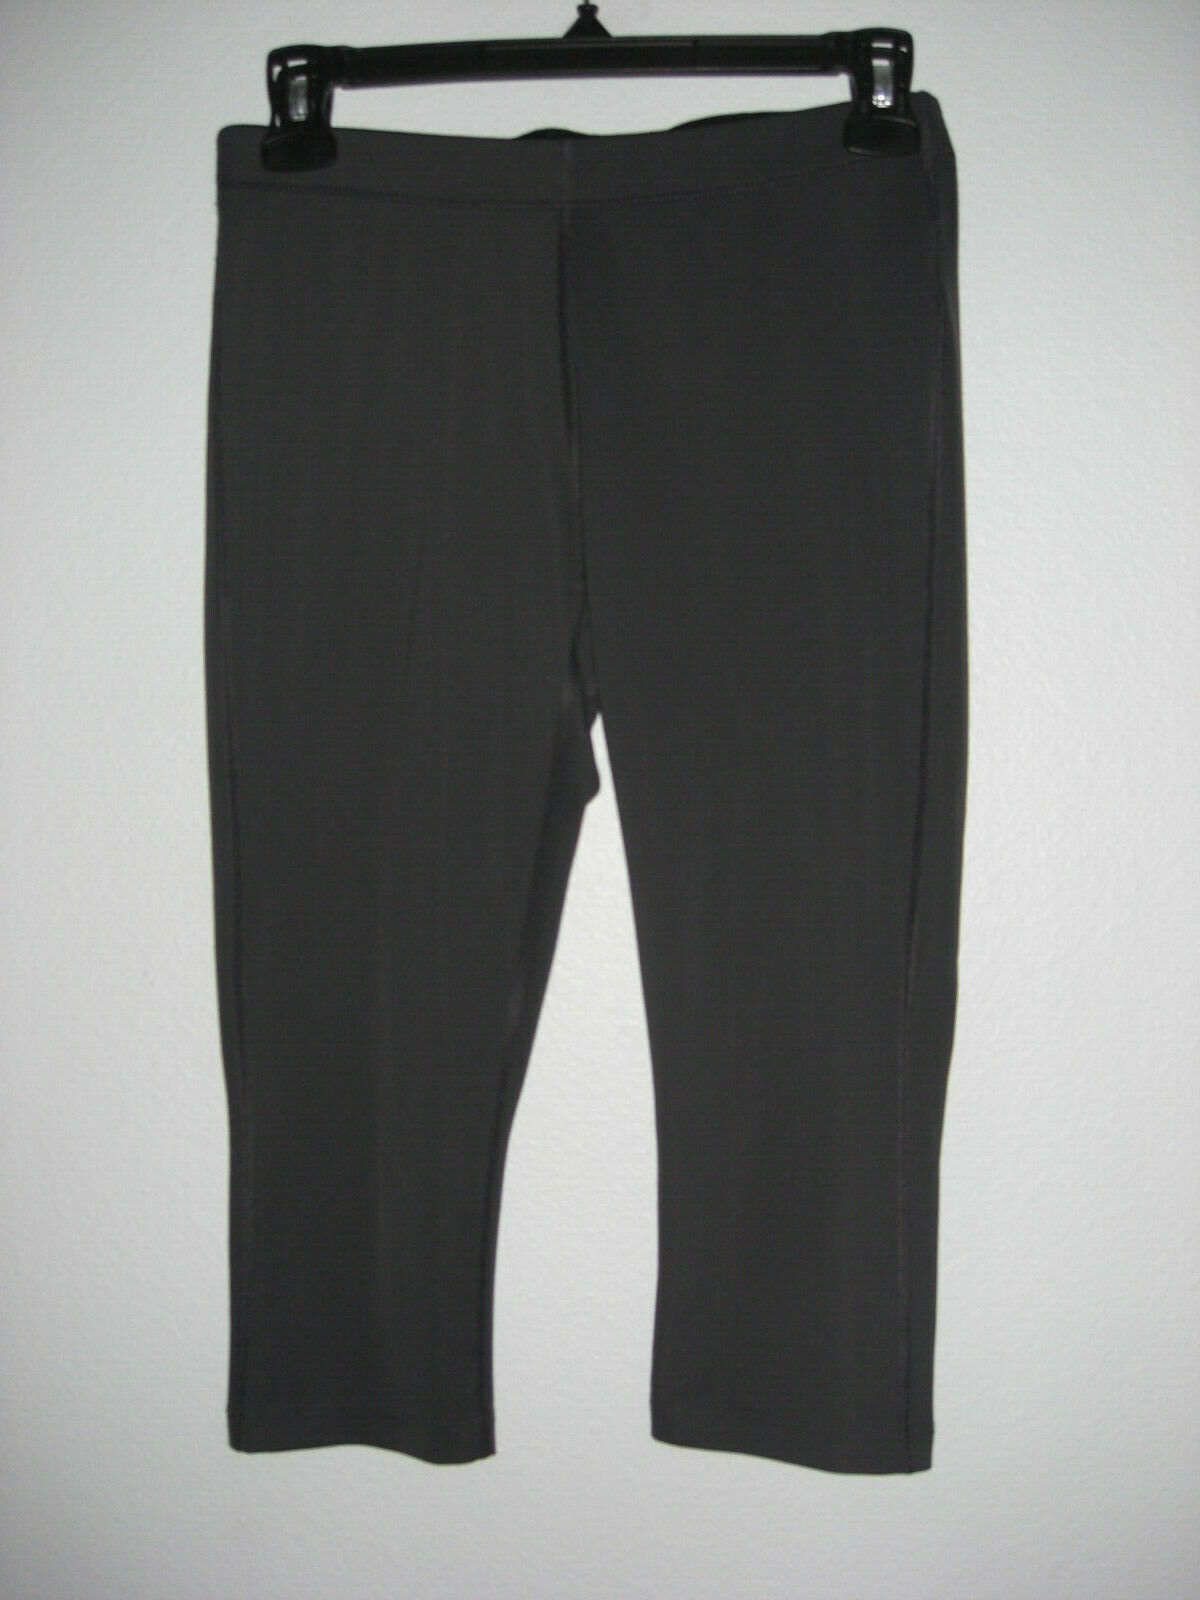 New Balance Women's Small Gray Capri Yoga Leggings Inseam 16